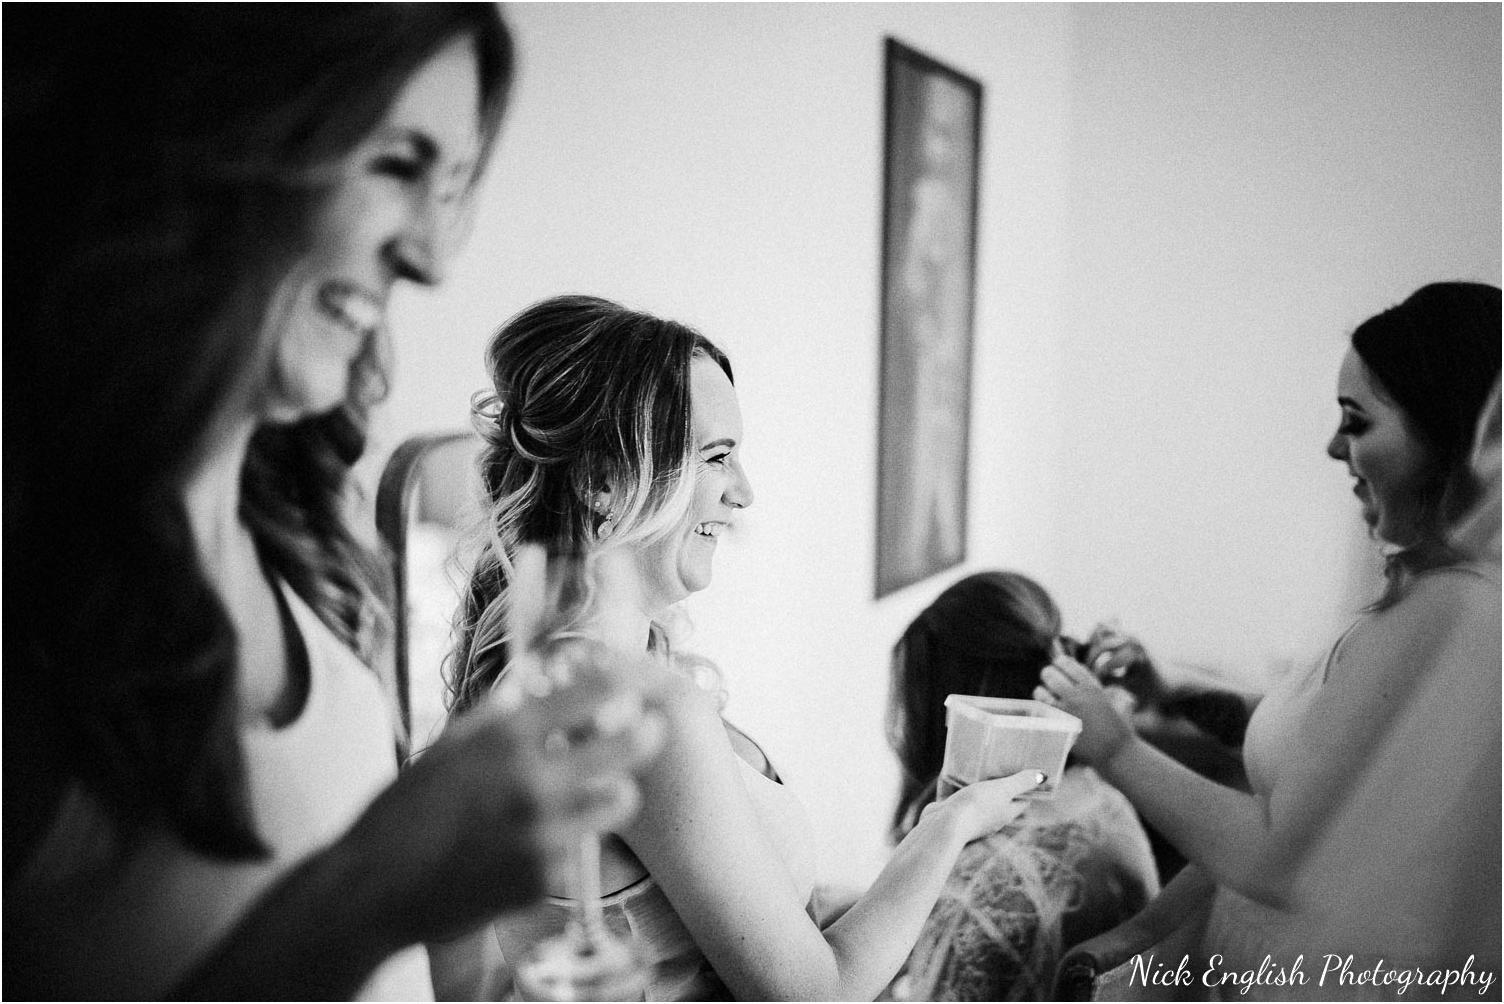 Destination_Wedding_Photographer_Slovenia_Nick_English_Photography-14.jpg